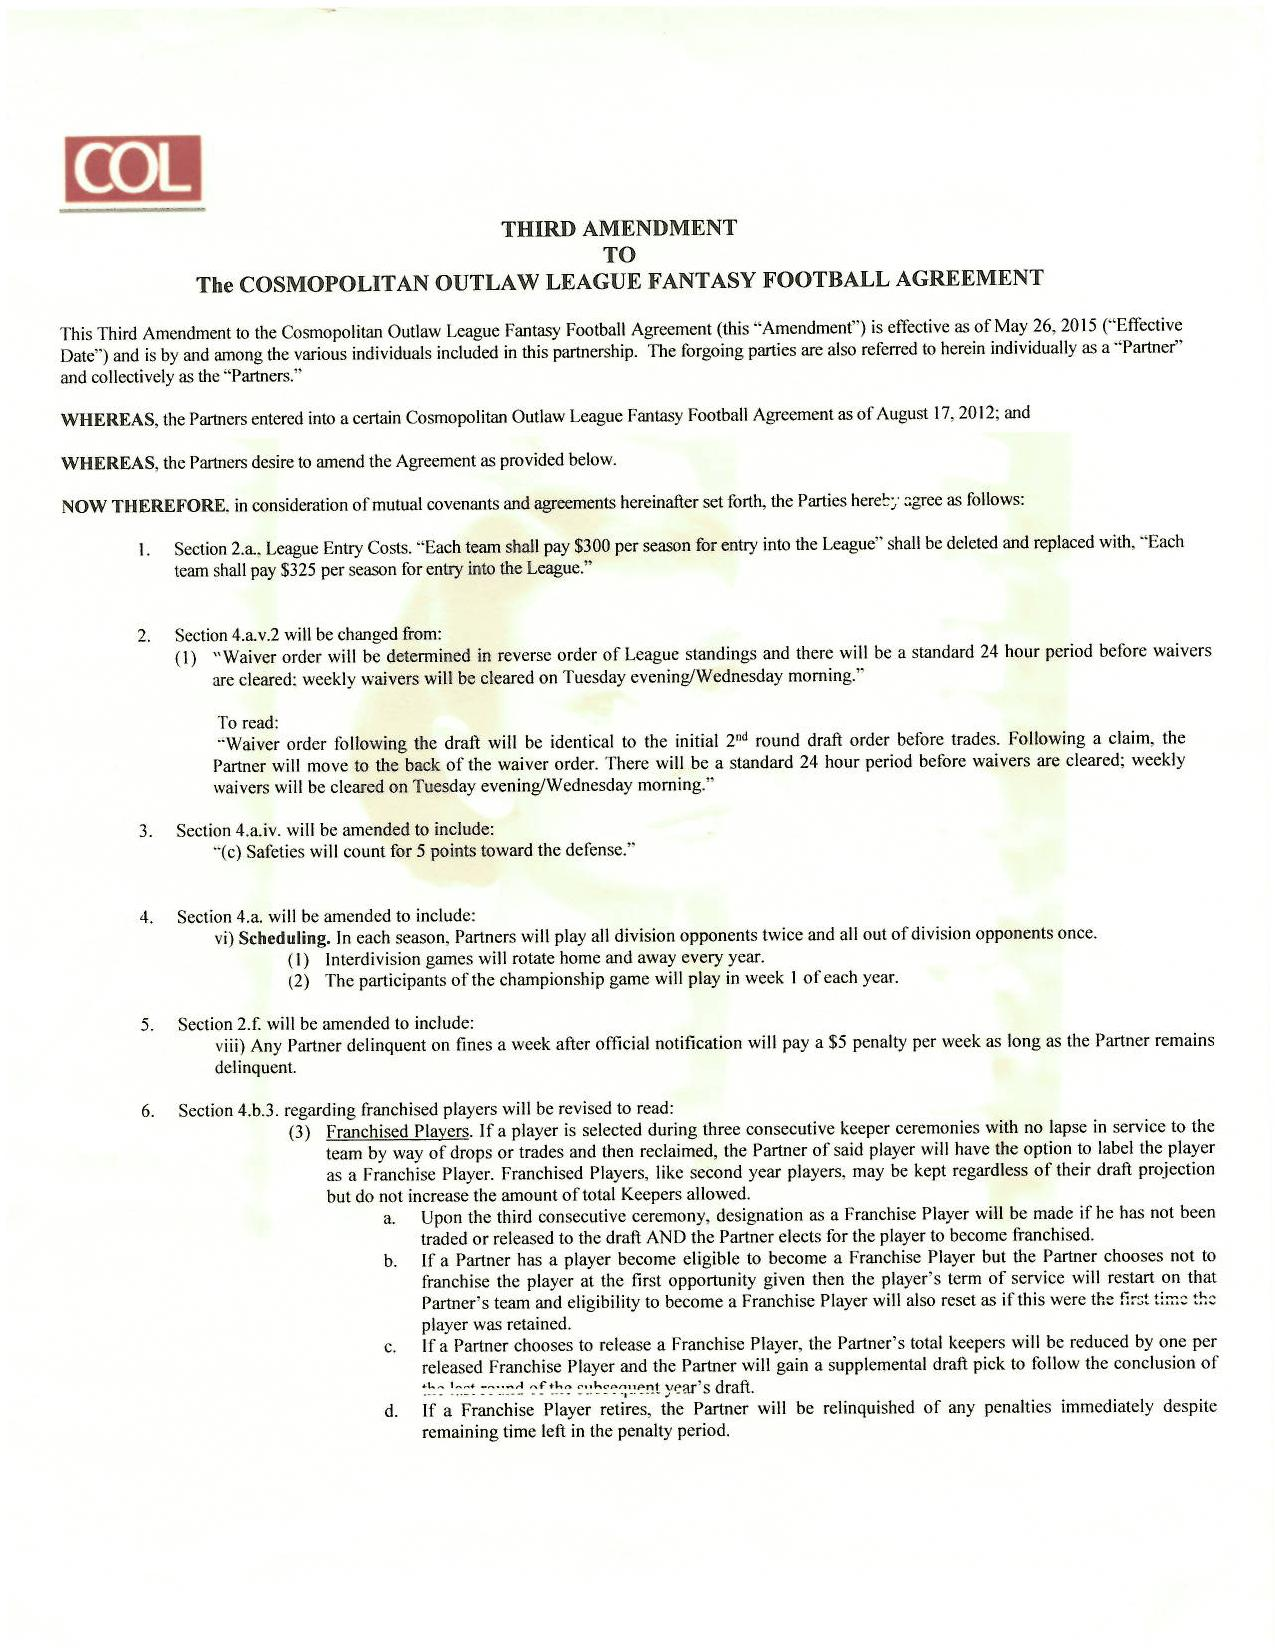 150526_3rd_Amendment_COL-page-001